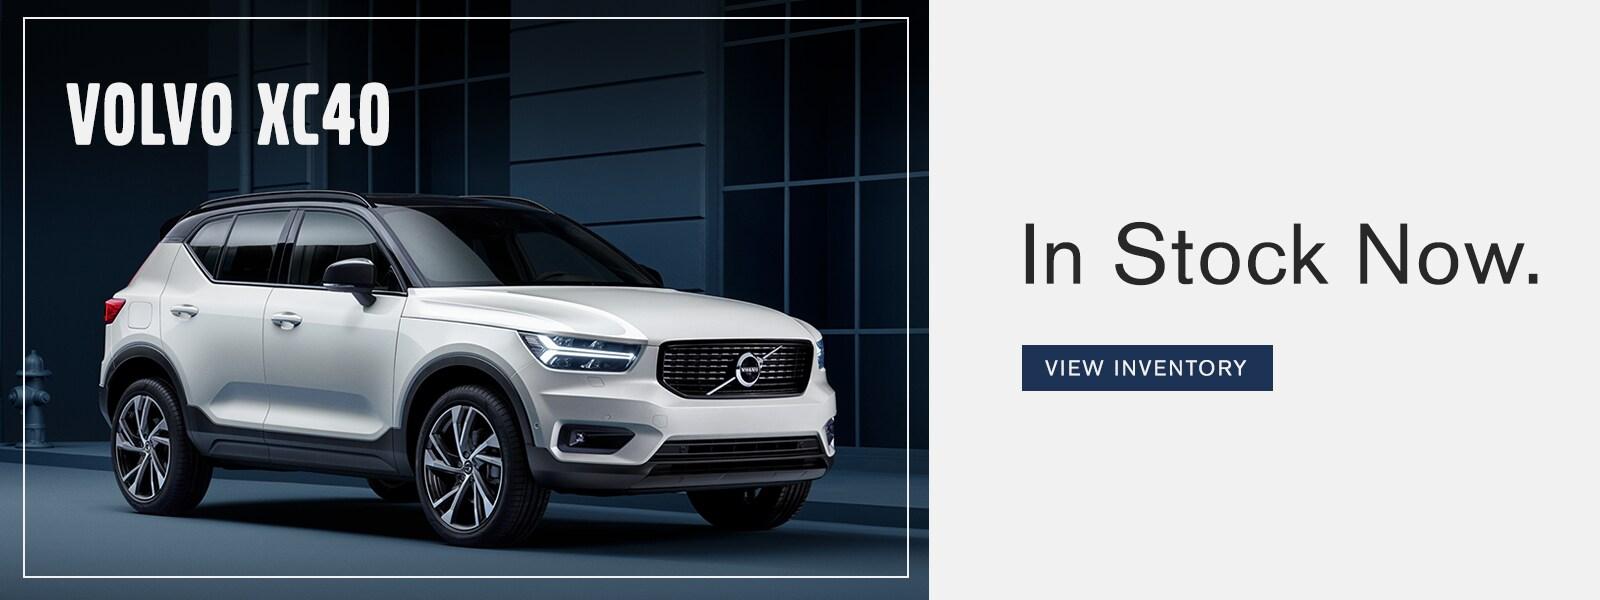 premier volvo cars overland park new 2017 2018 volvo used car dealership near kansas city mo. Black Bedroom Furniture Sets. Home Design Ideas